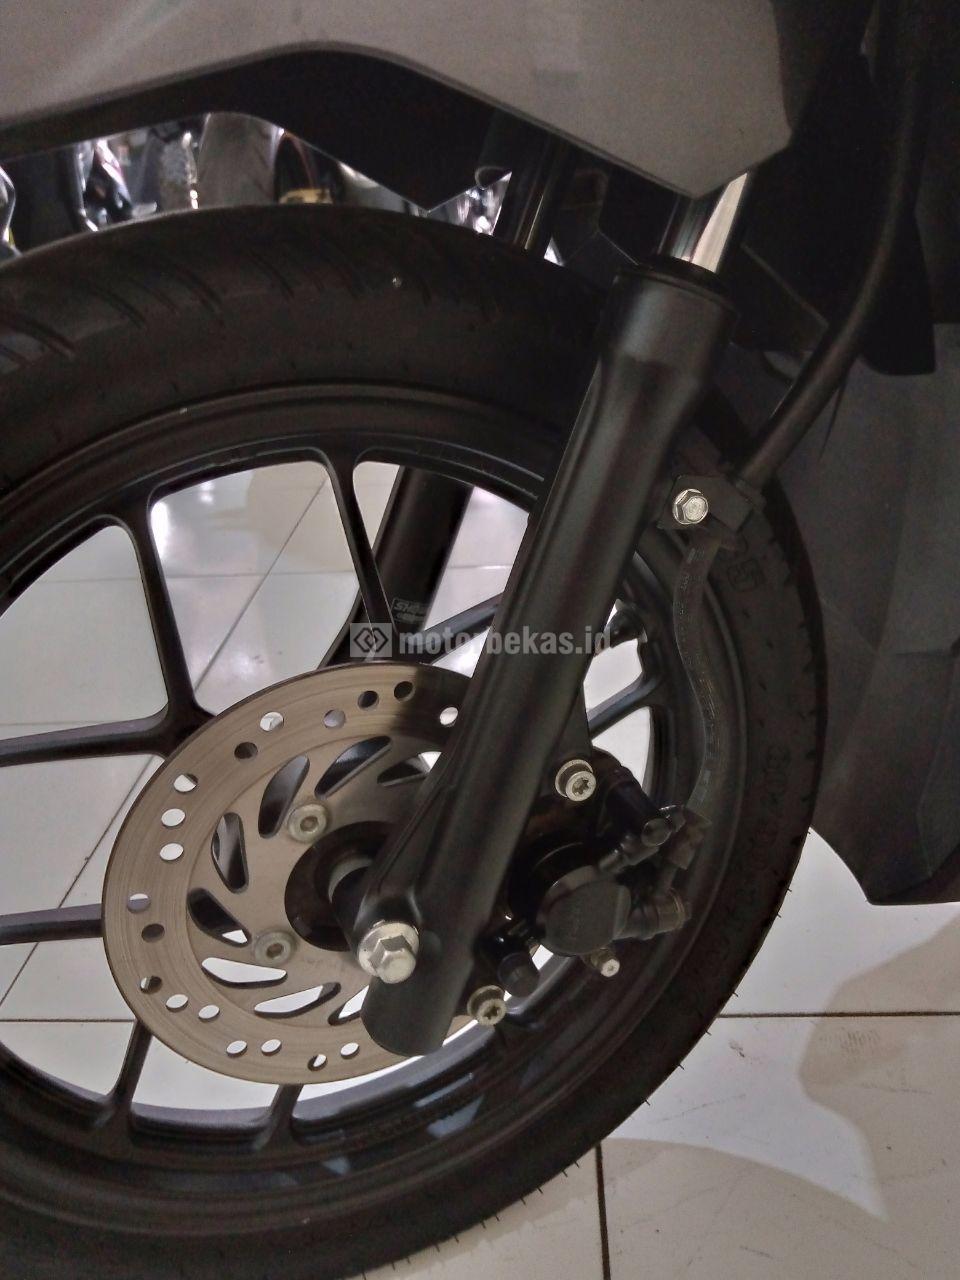 HONDA VARIO TECHNO 125  2083 motorbekas.id